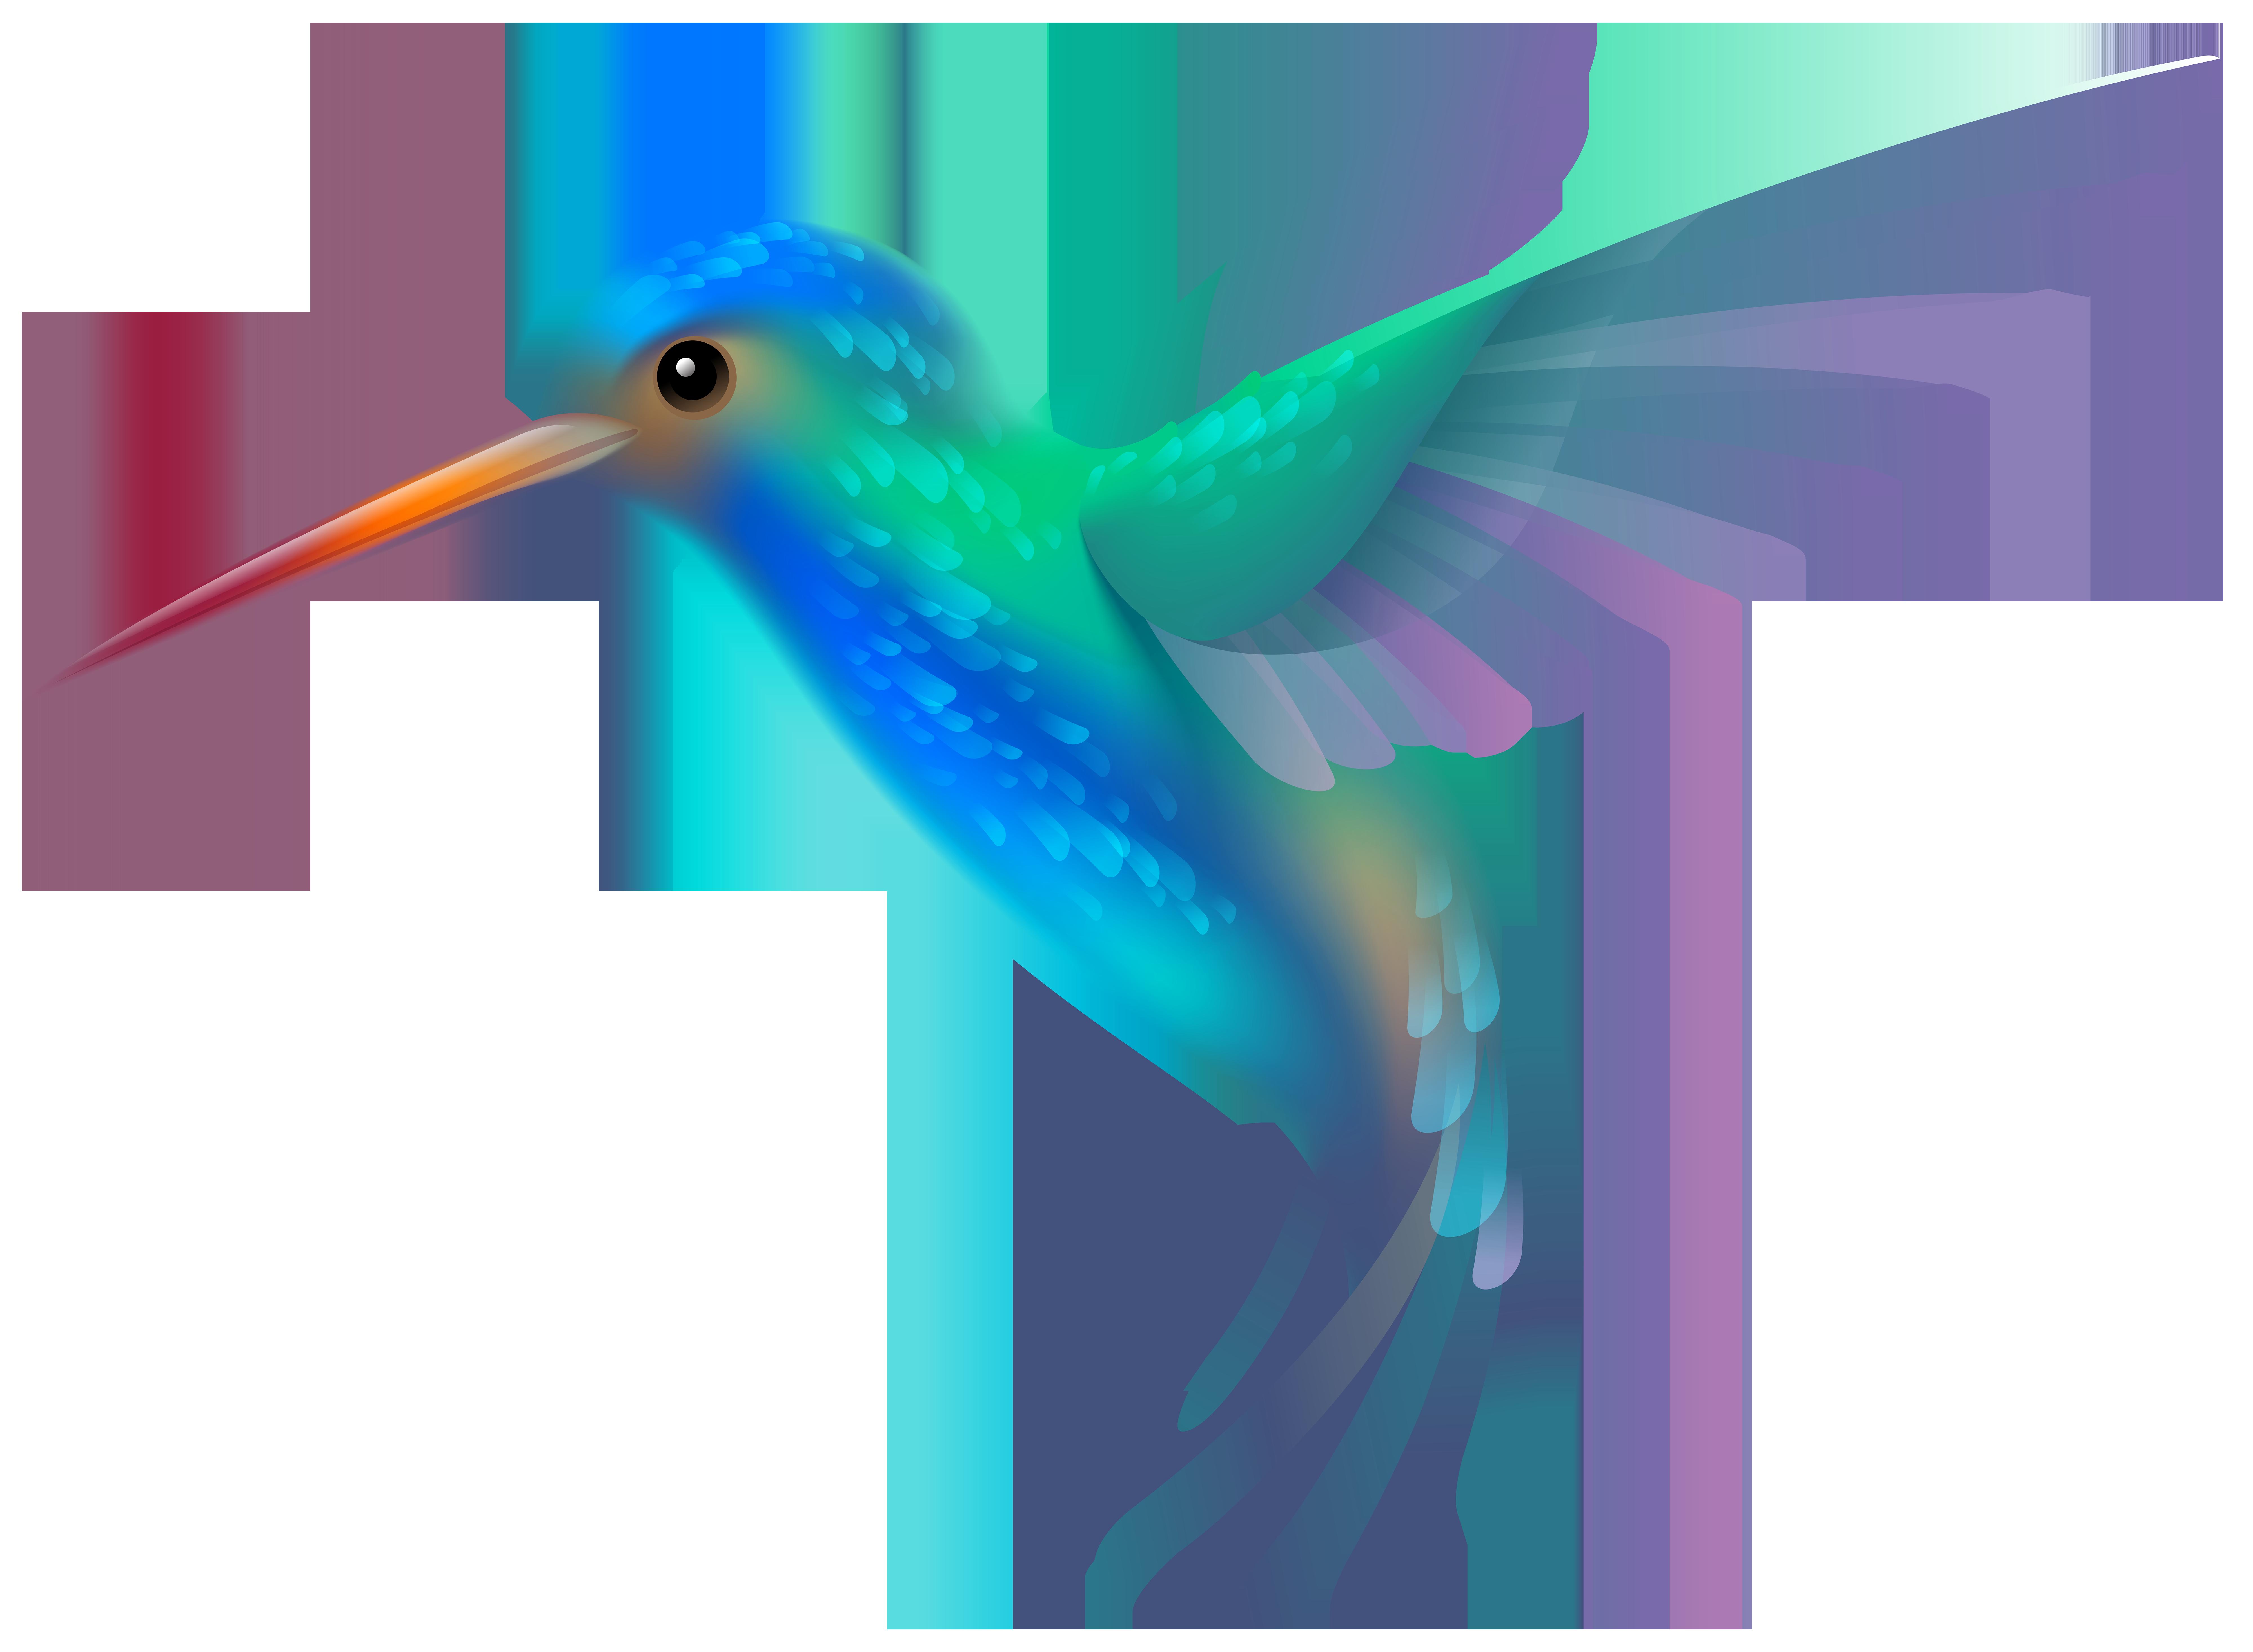 Hummingbird clipart #2, Download drawings